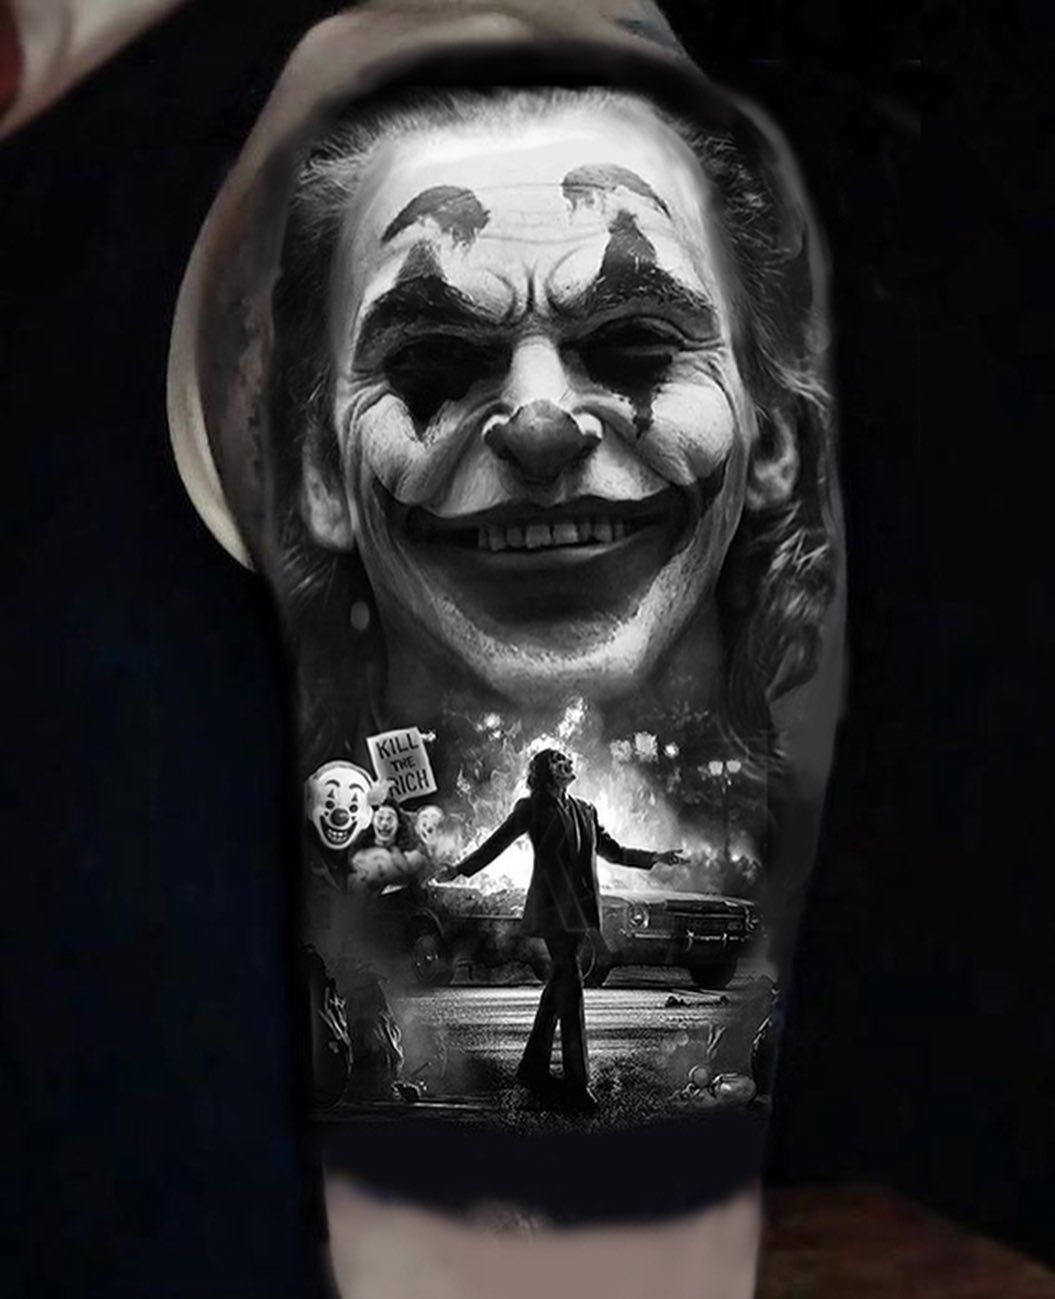 Got A Healed Photo Of A Joker Hand Piece I Did Couple Weeks Ago Joker Jokersmile Joker Smile Hand Tattoo Joker Tattoo Joker Smile Tattoo